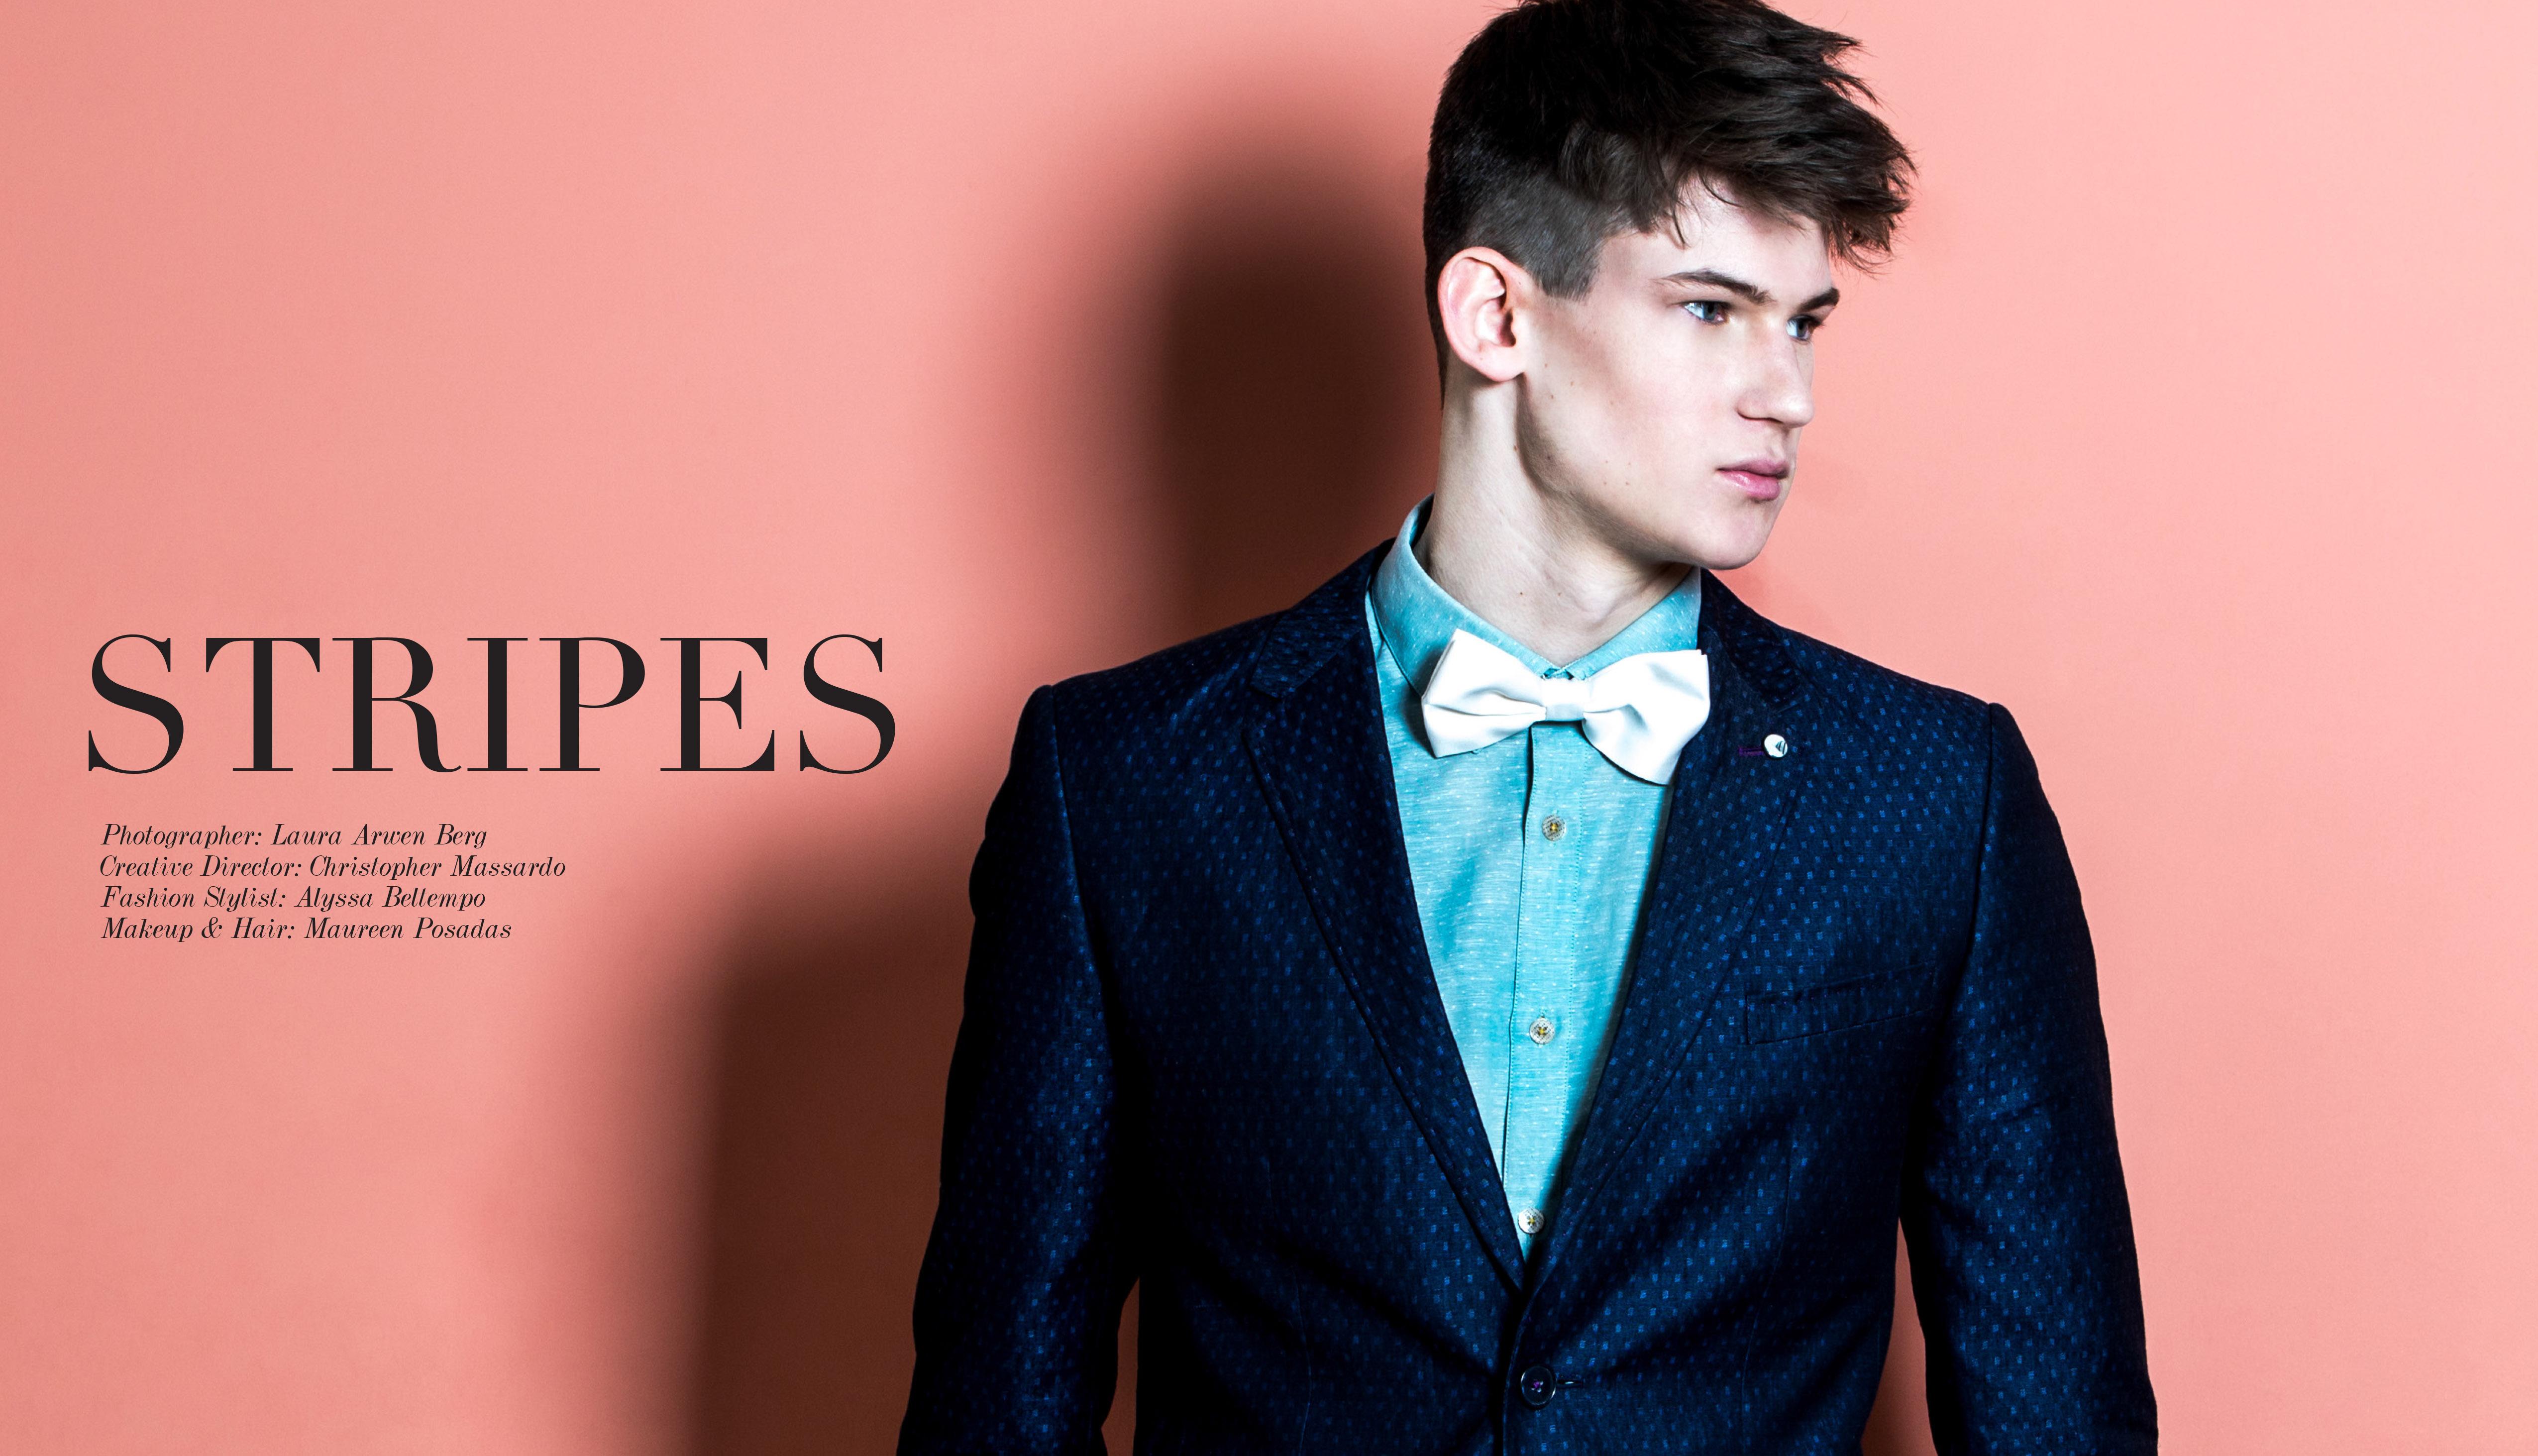 STRIPES sheets-1